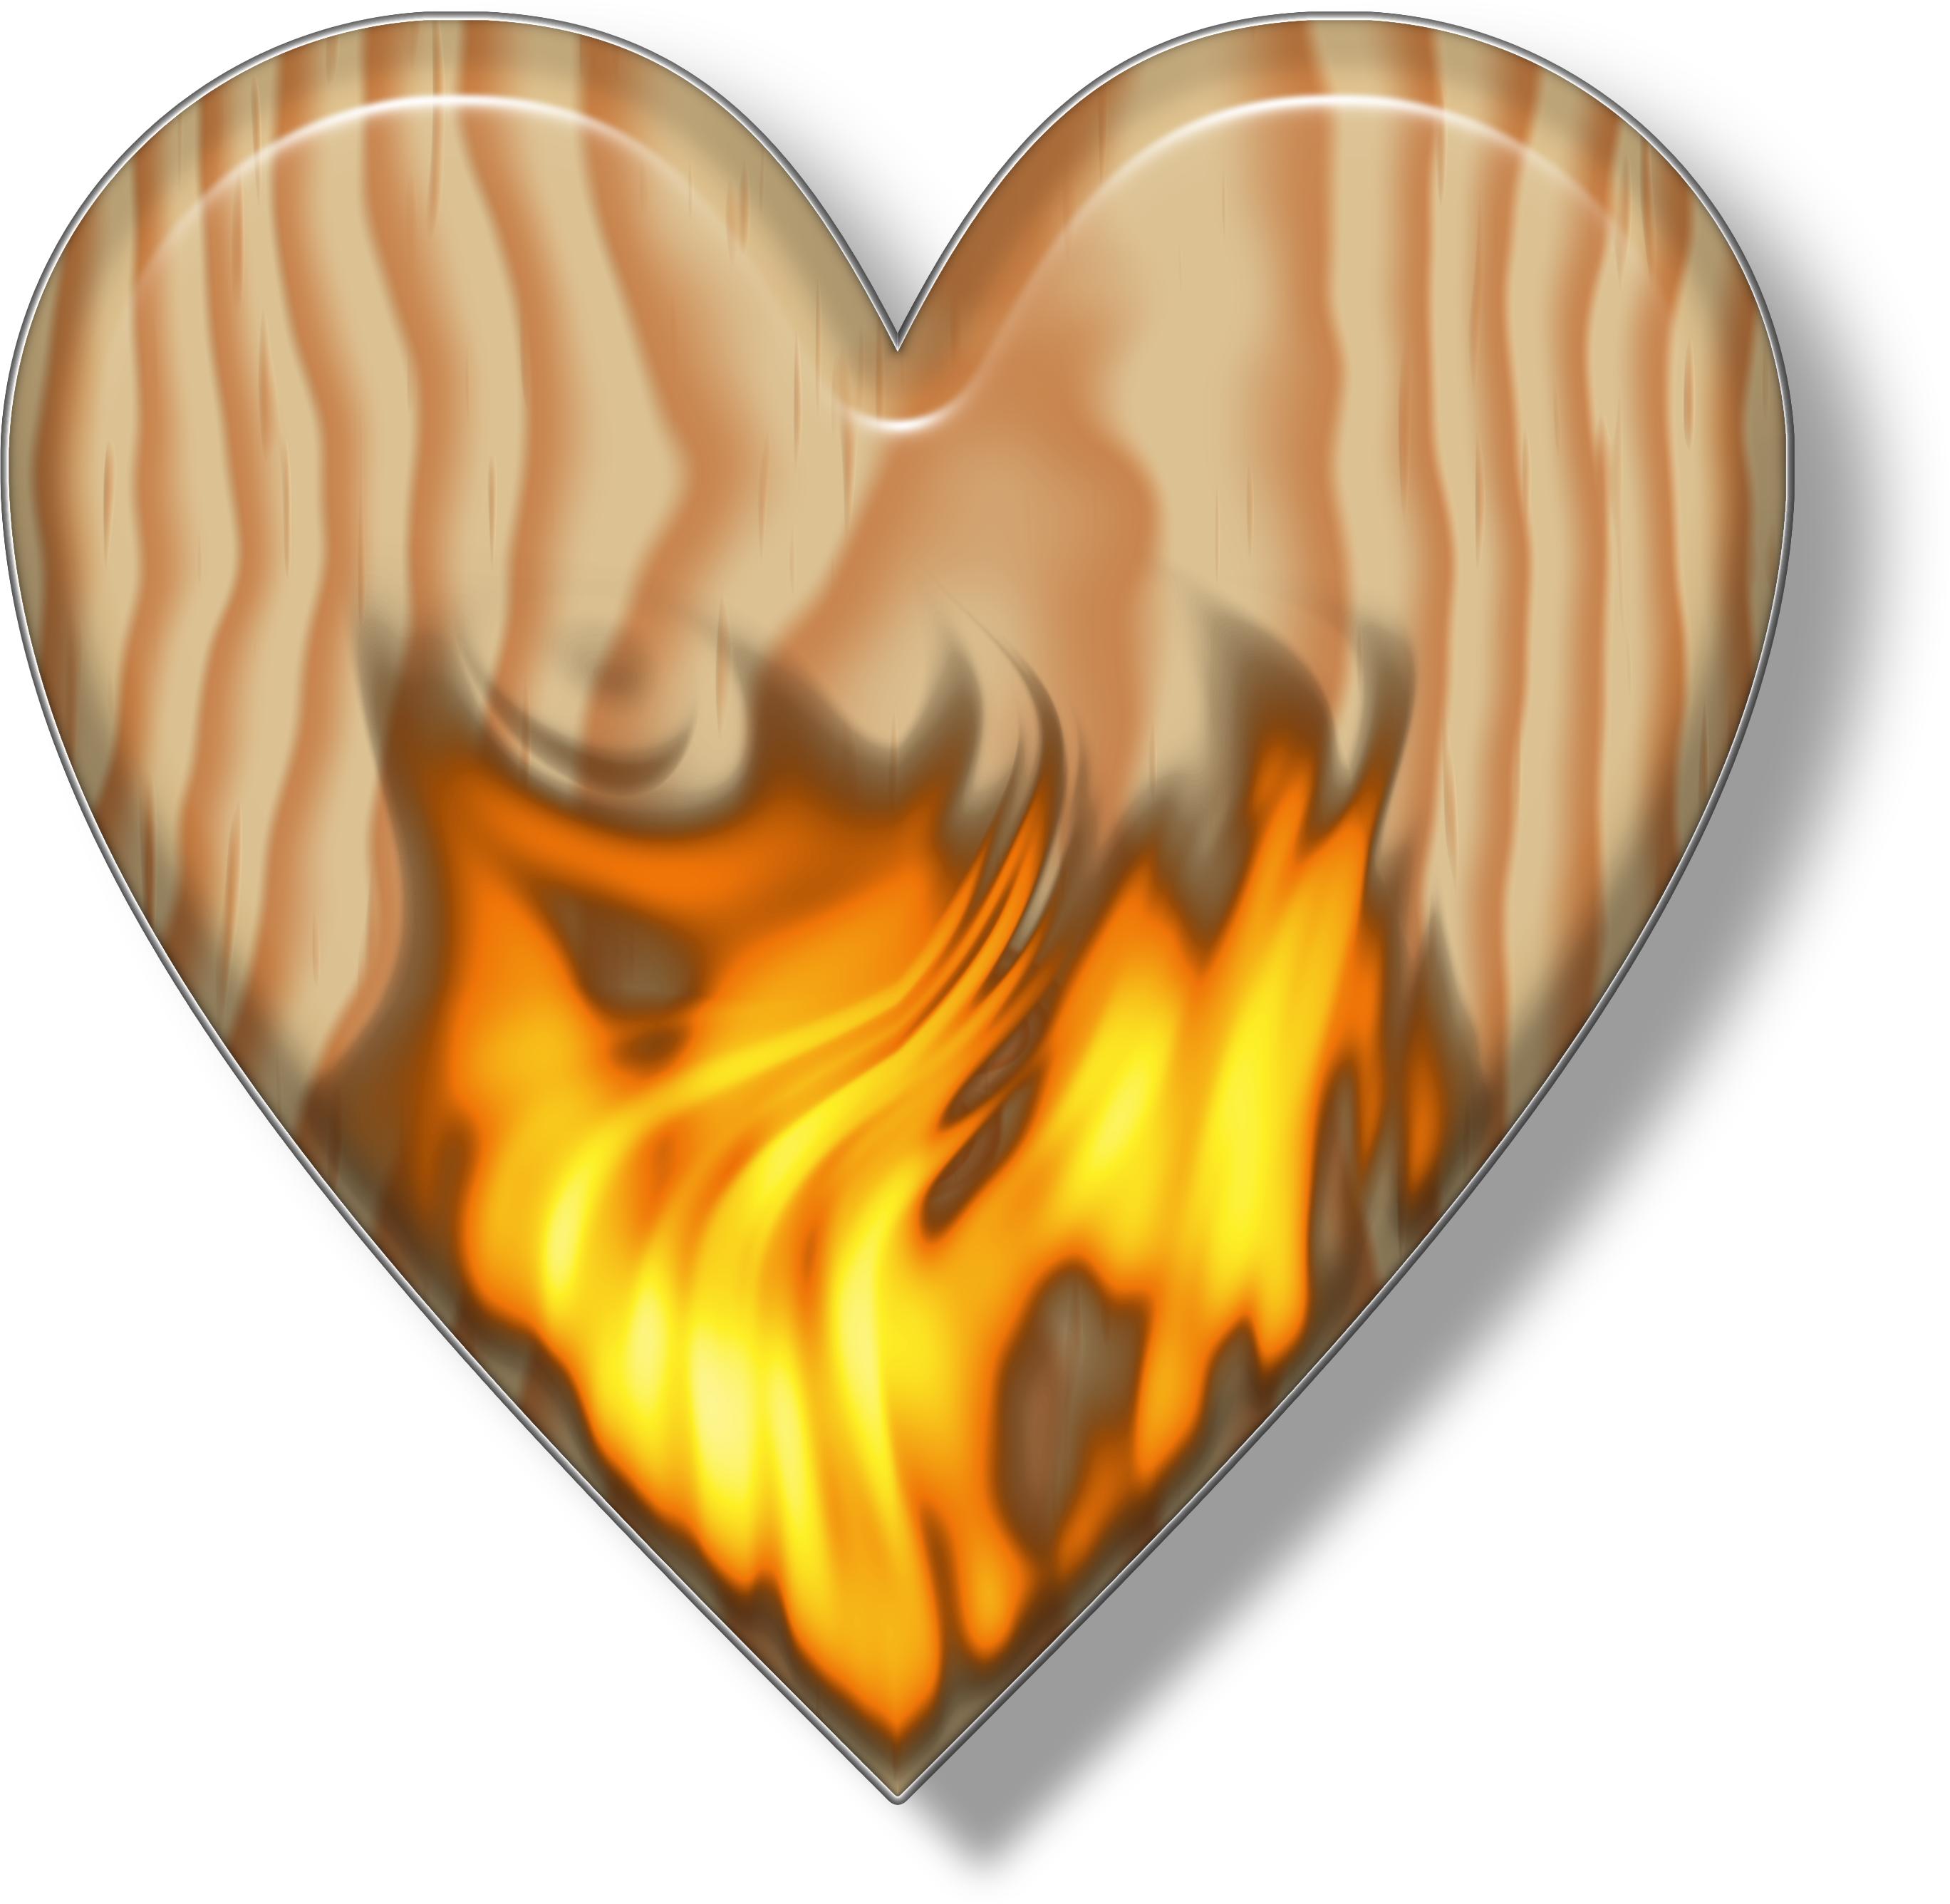 Flaming Wooden Heart.